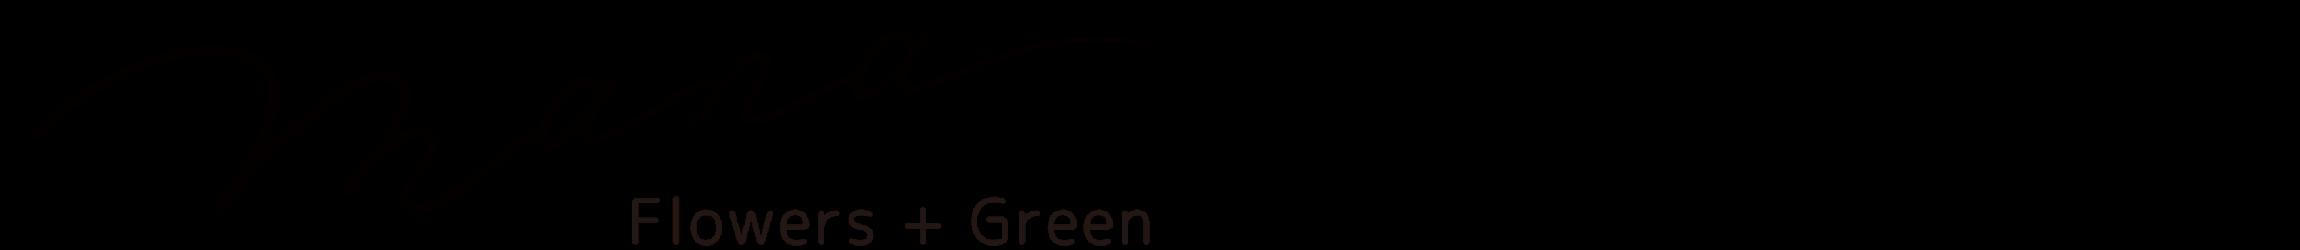 Mana Flowers + Green